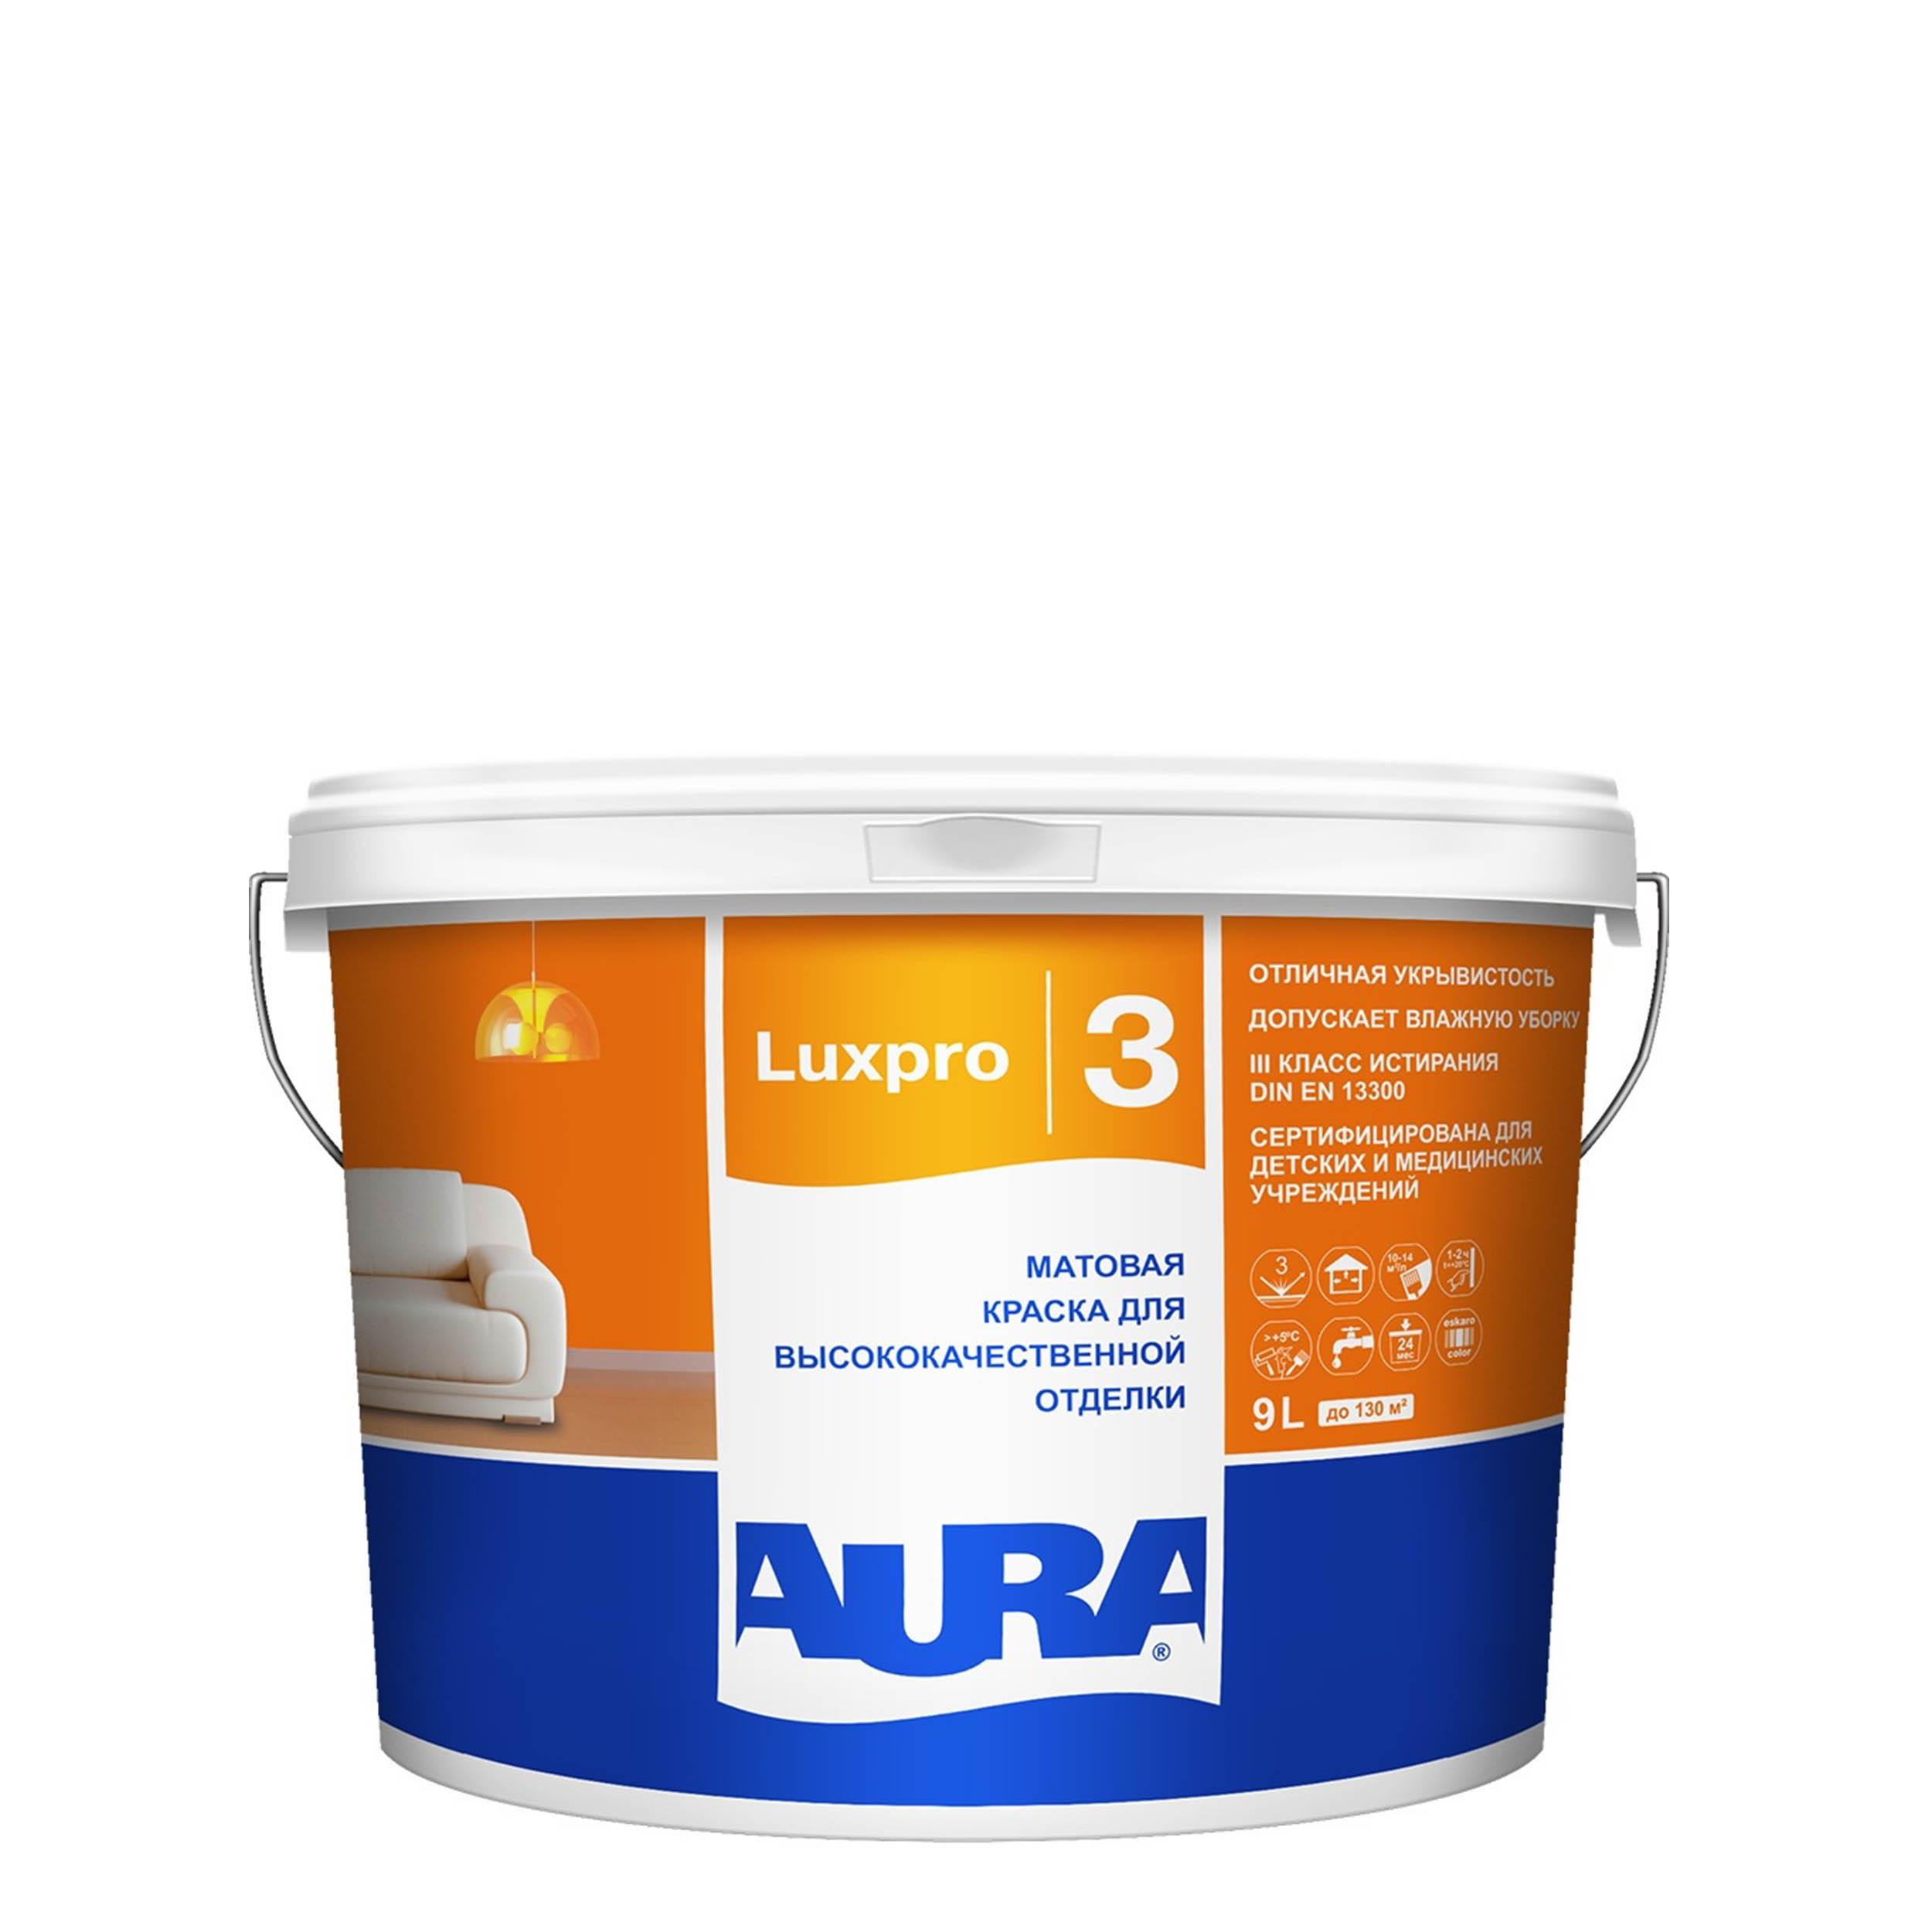 Фото 4 - Краска интерьерная, Aura LuxPRO 3, RAL 3028, 11 кг.